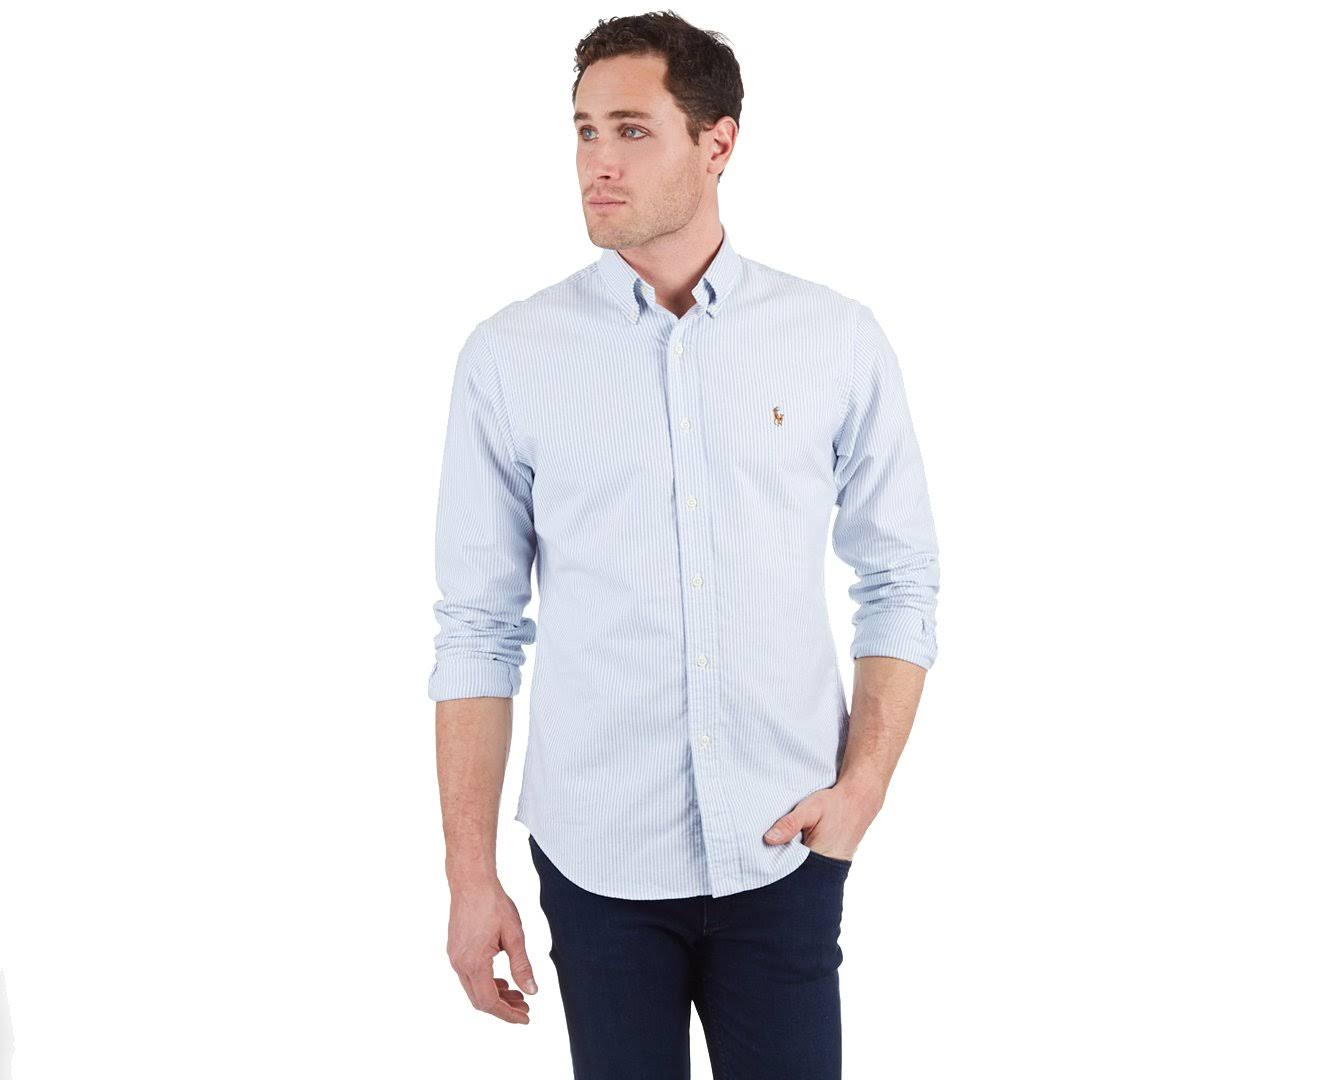 Azul Rayas Lauren Fit Ralph De Para Polo Camisa Hombre Blanco s Slim aqvtwna6